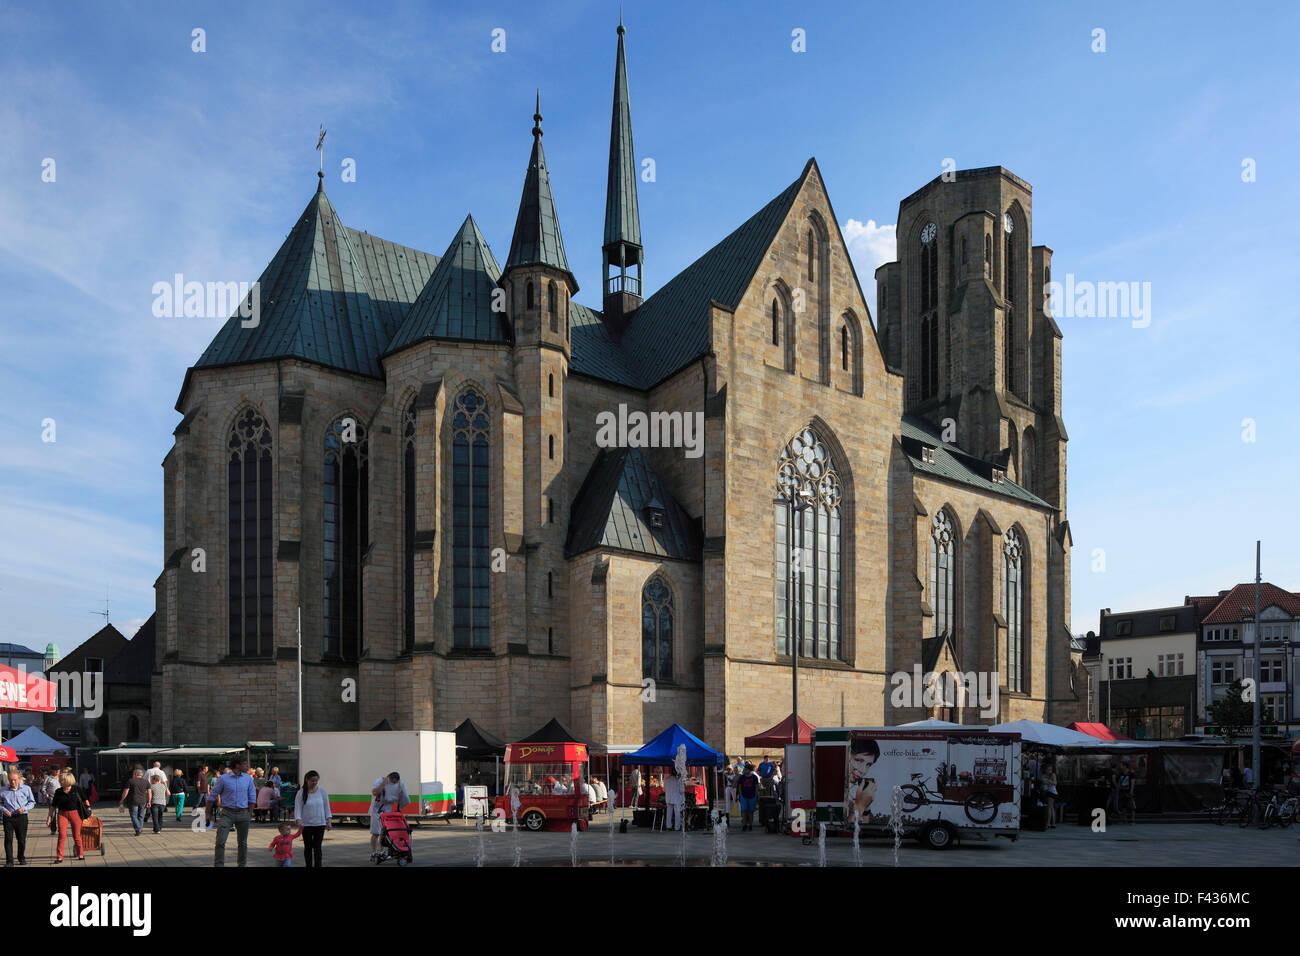 katholische propsteikirche sankt urbanus in gelsenkirchen buer stock photo royalty free image. Black Bedroom Furniture Sets. Home Design Ideas